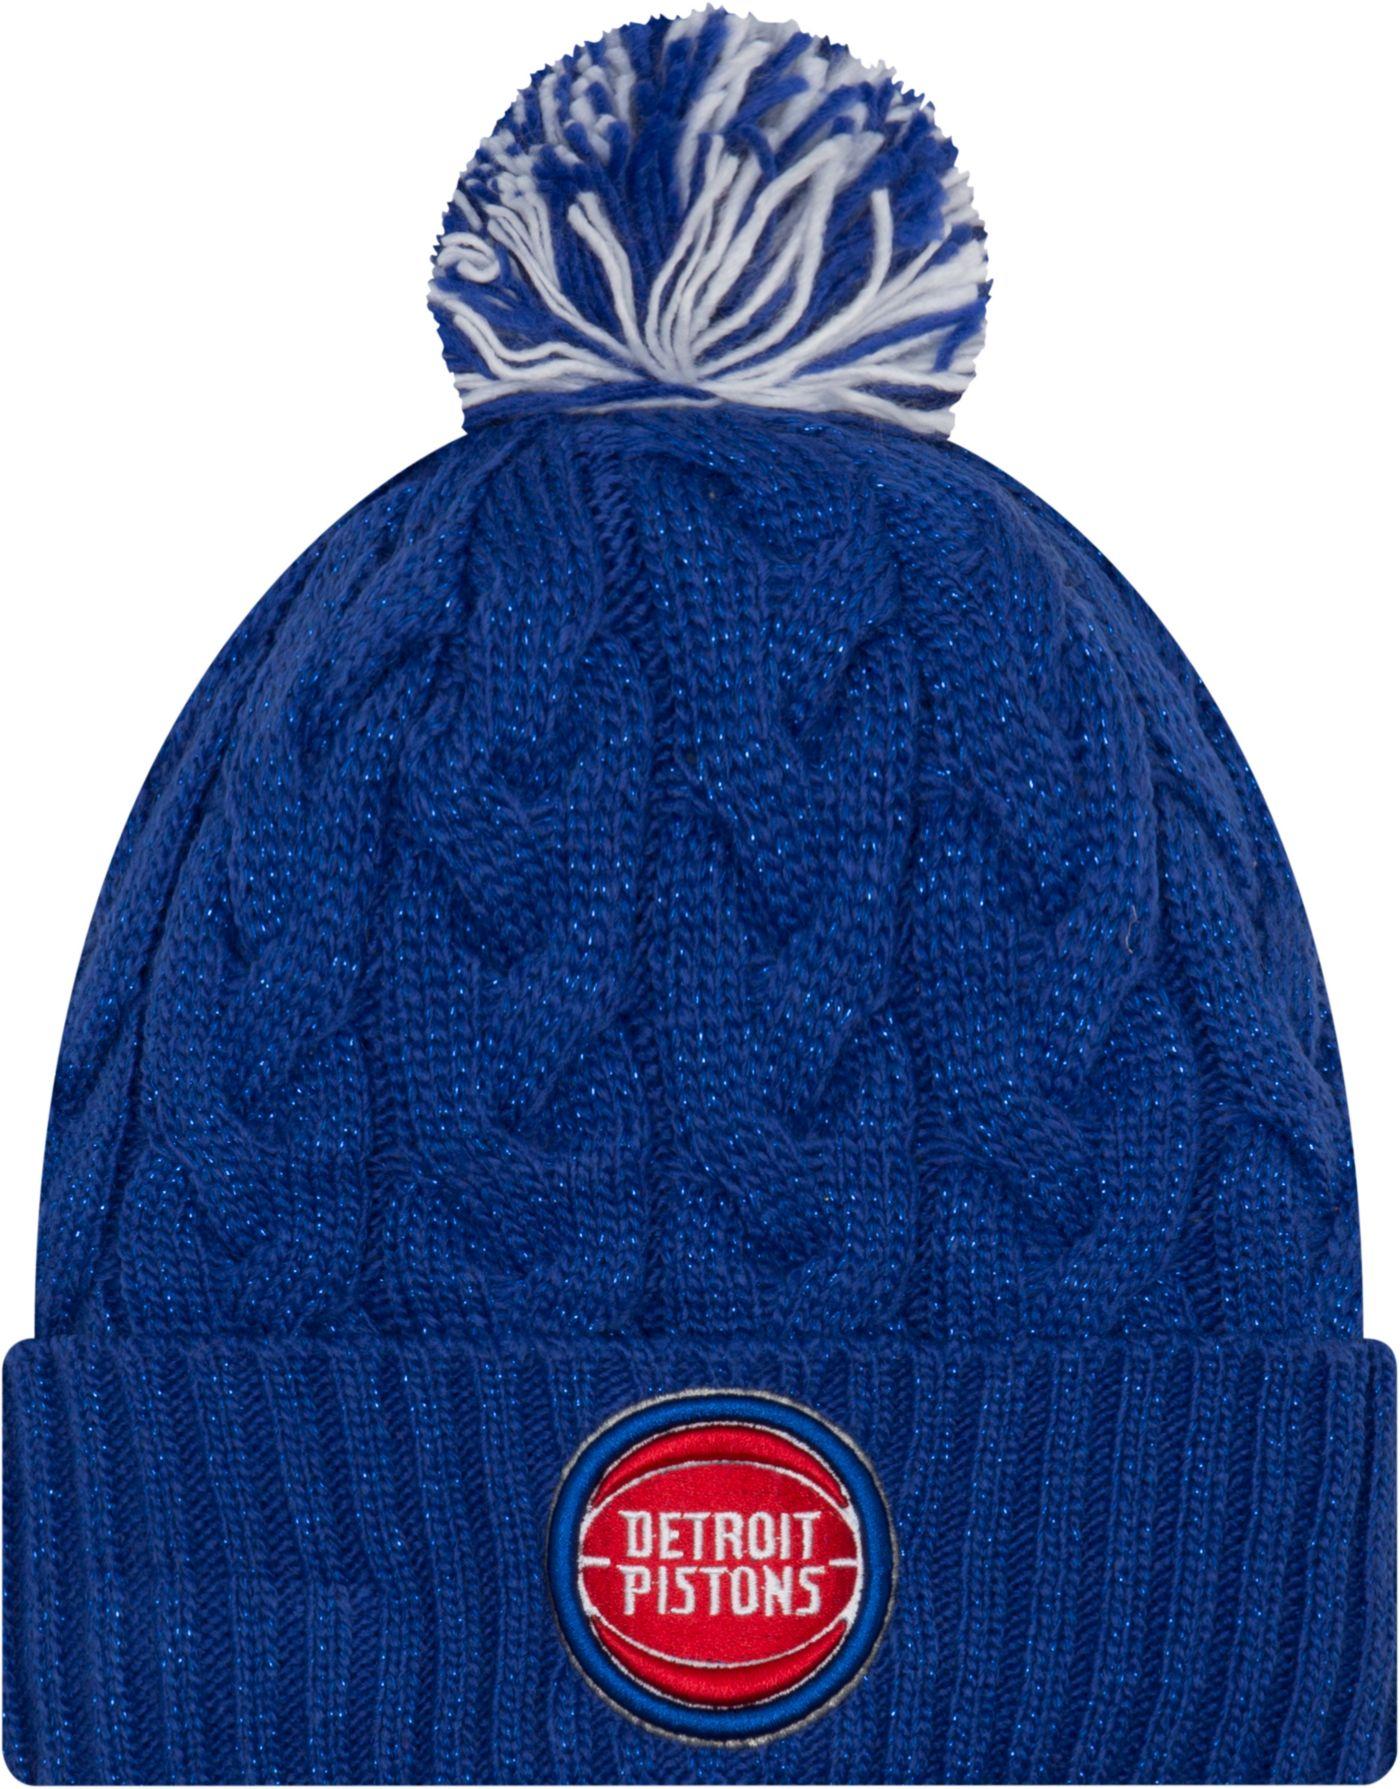 New Era Women's Detroit Pistons Cozy Knit Hat